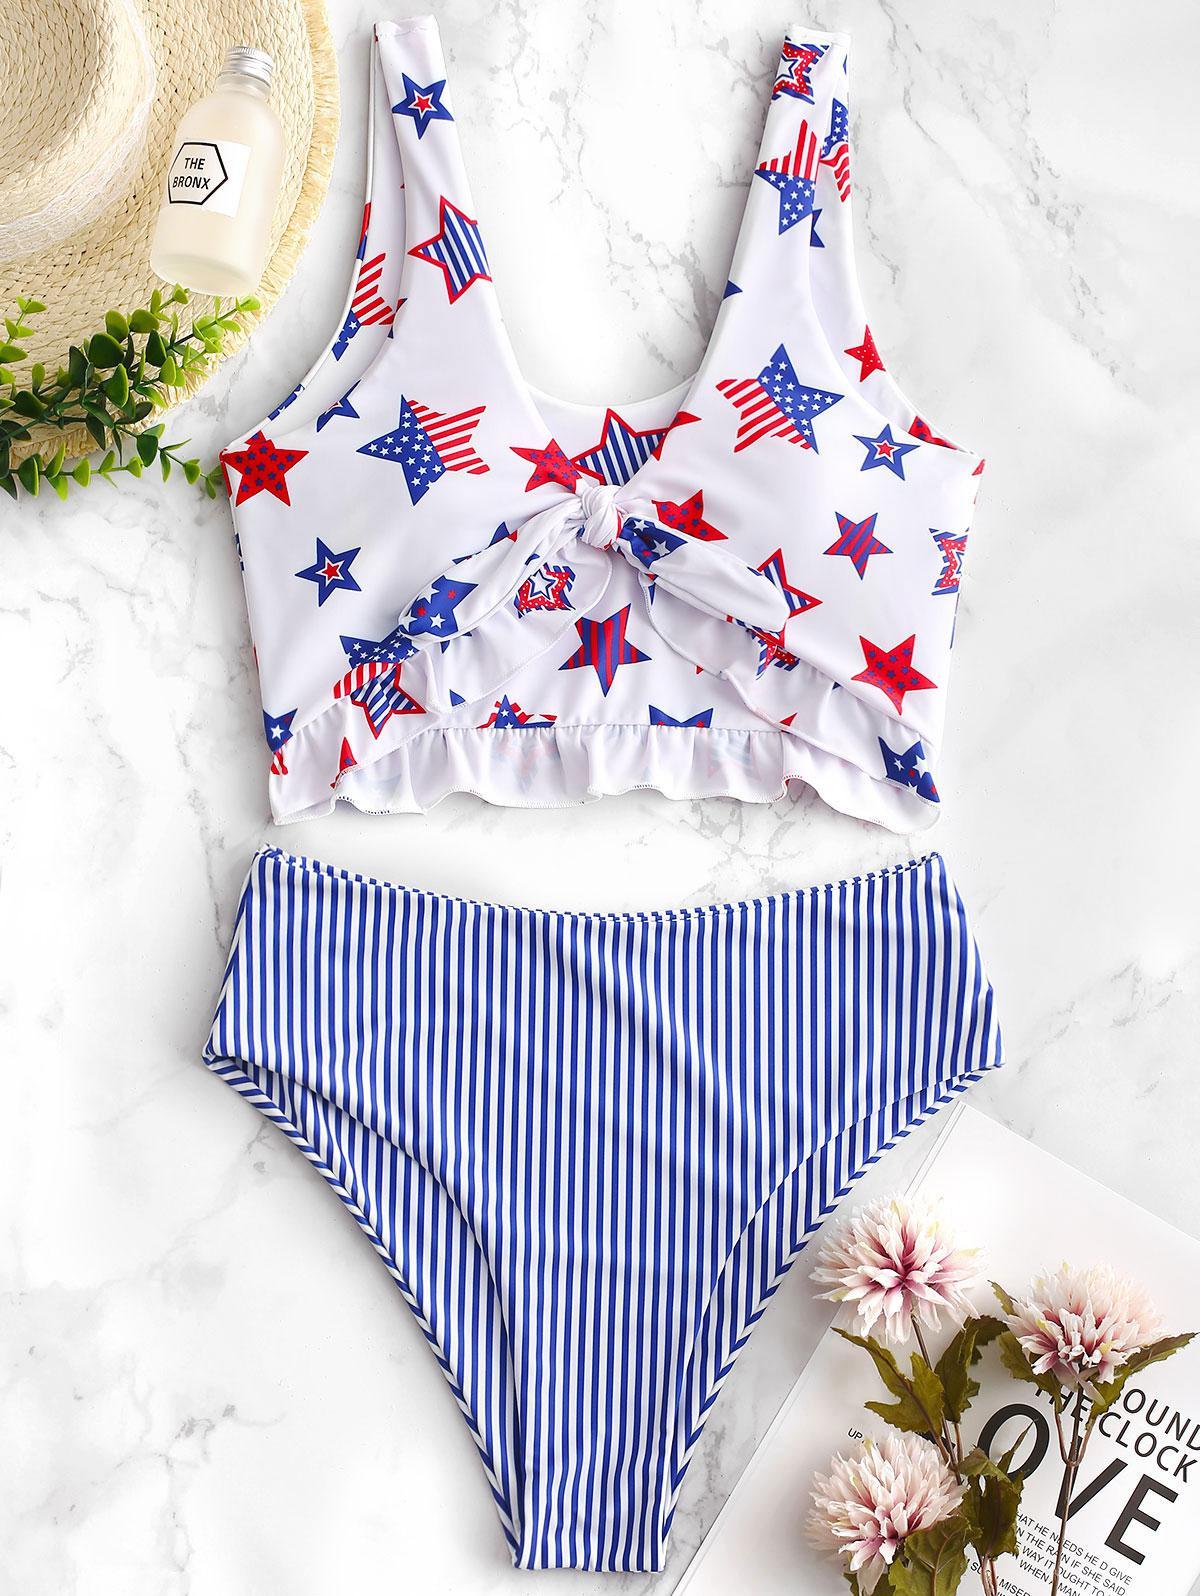 ZAFUL Patriotic American Flag Ruffle Tankini Swimsuit фото